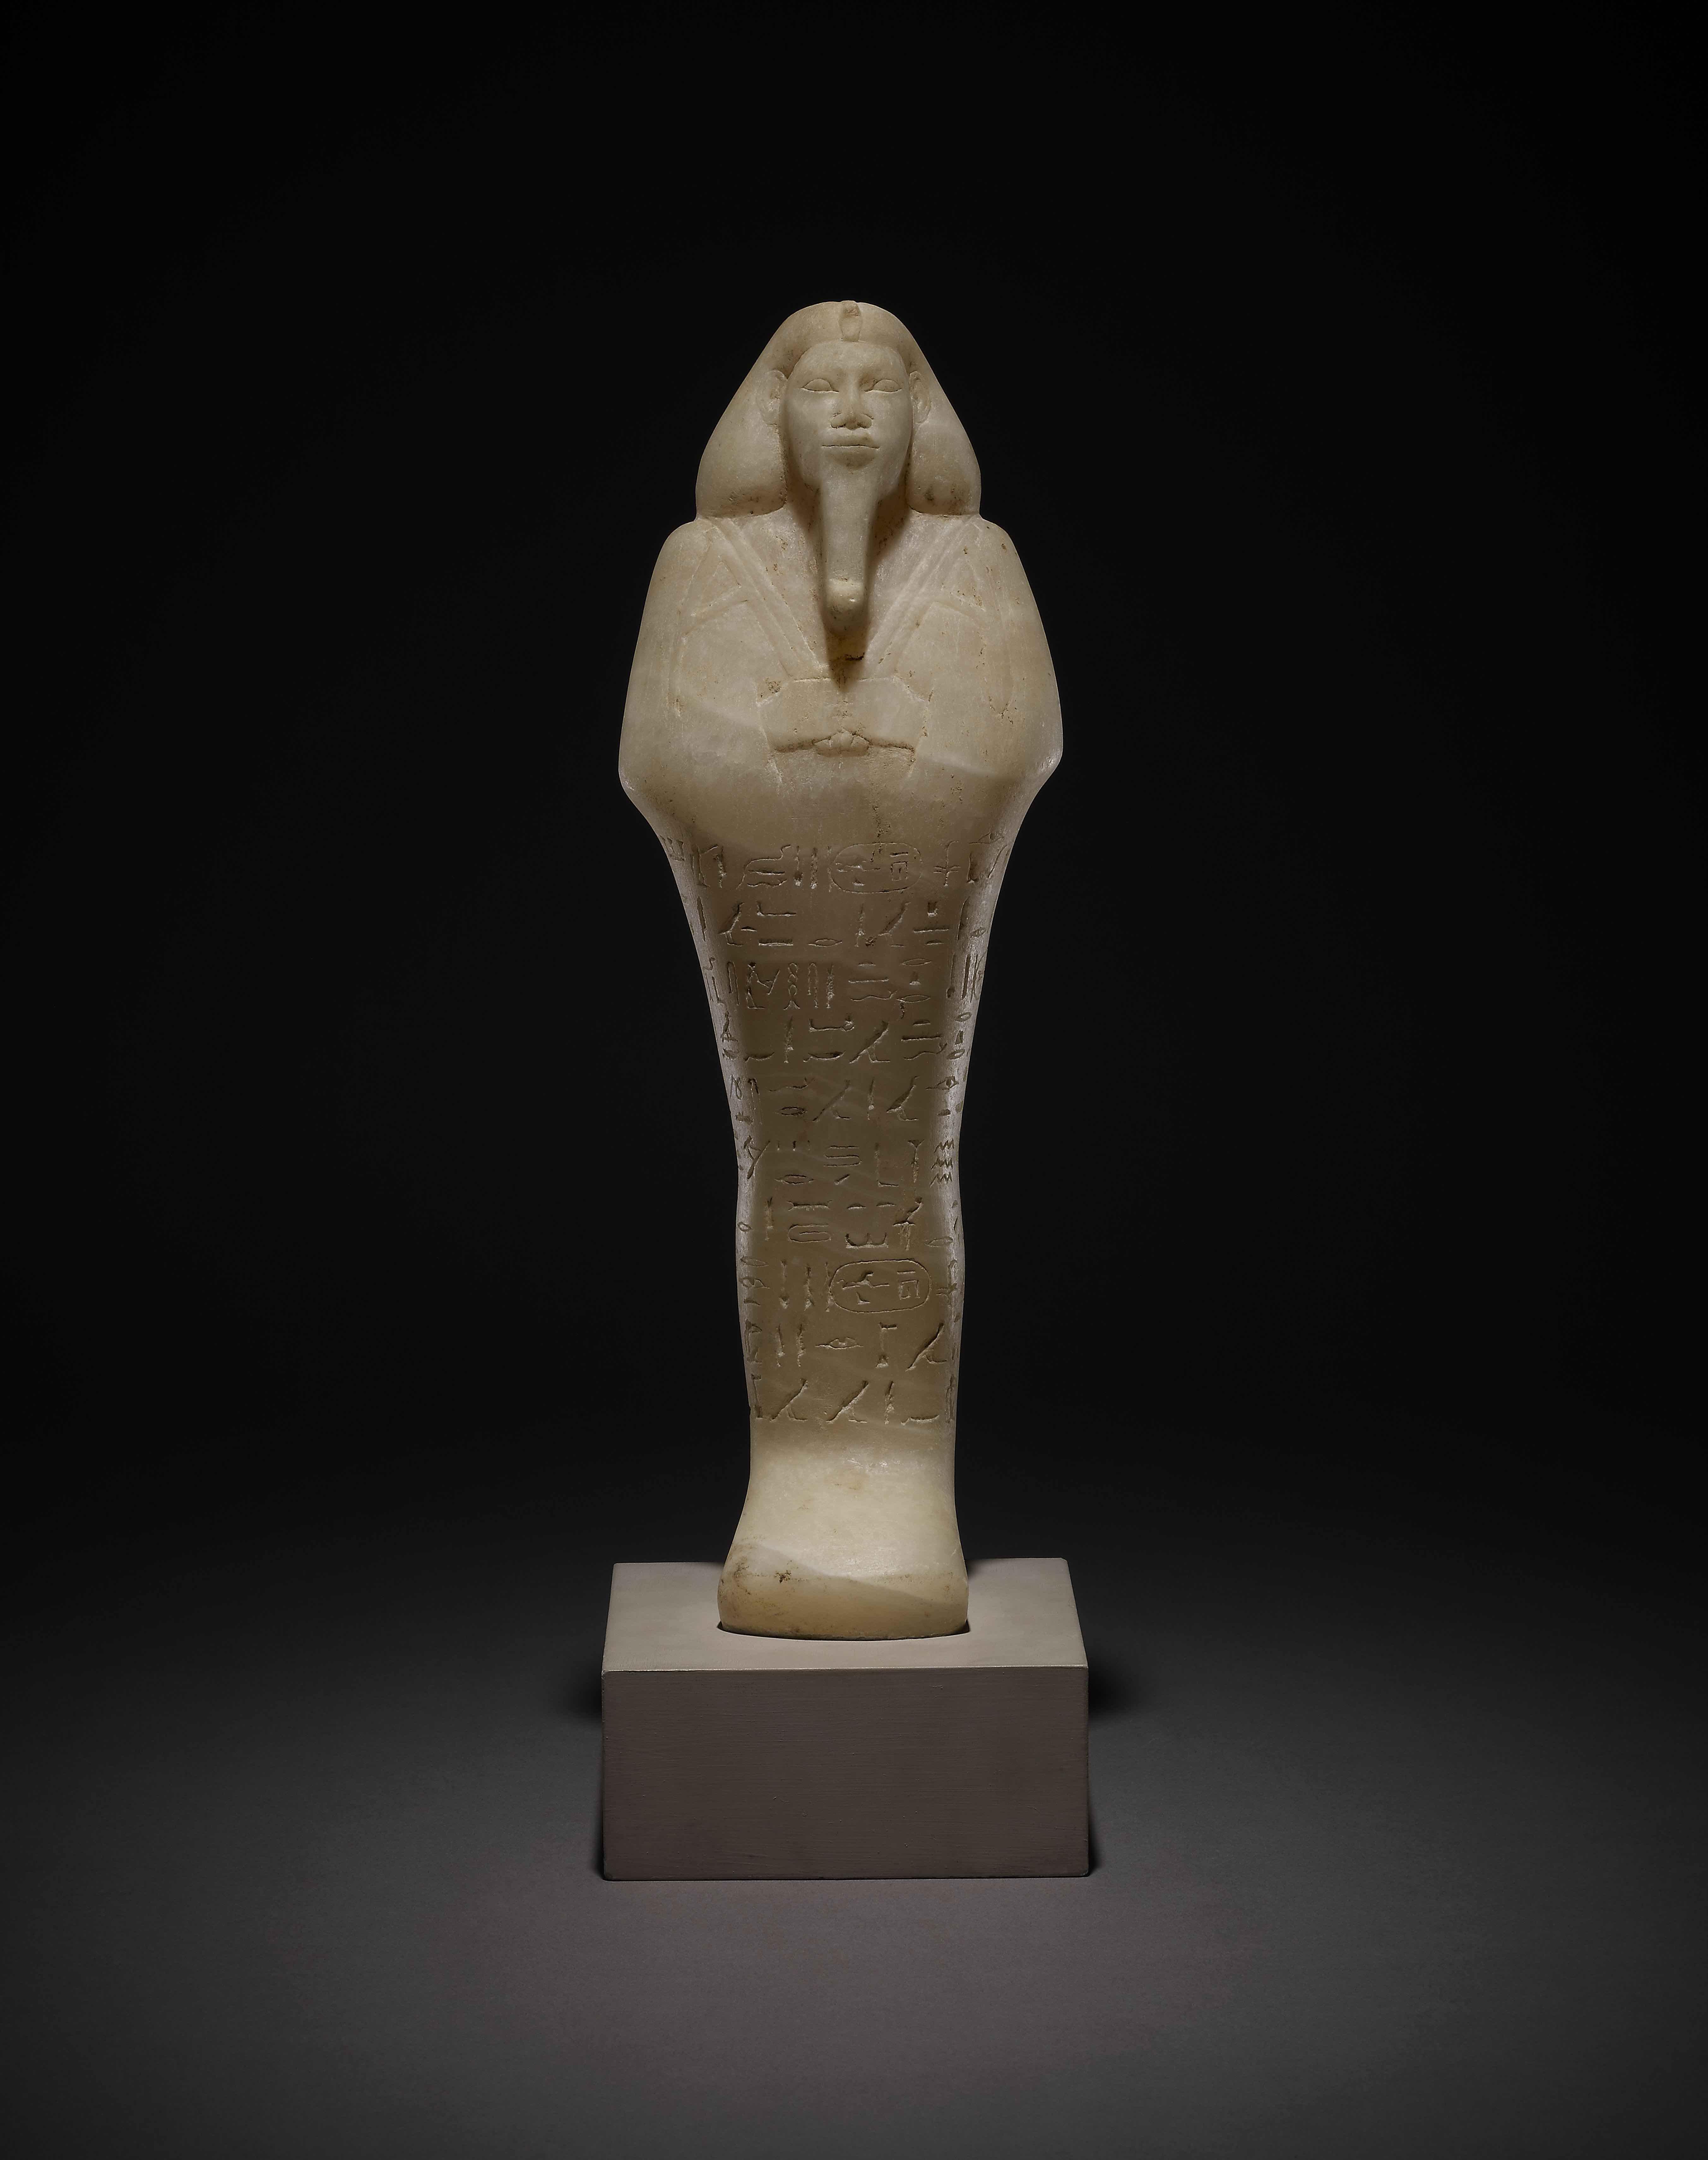 i-ushebti-i-del-faraon-taharqa-calcita-dinastia-xxv-reinado-de-taharqa-c-690-664-a-c-tumba-de-taharqa-nuri-sudan